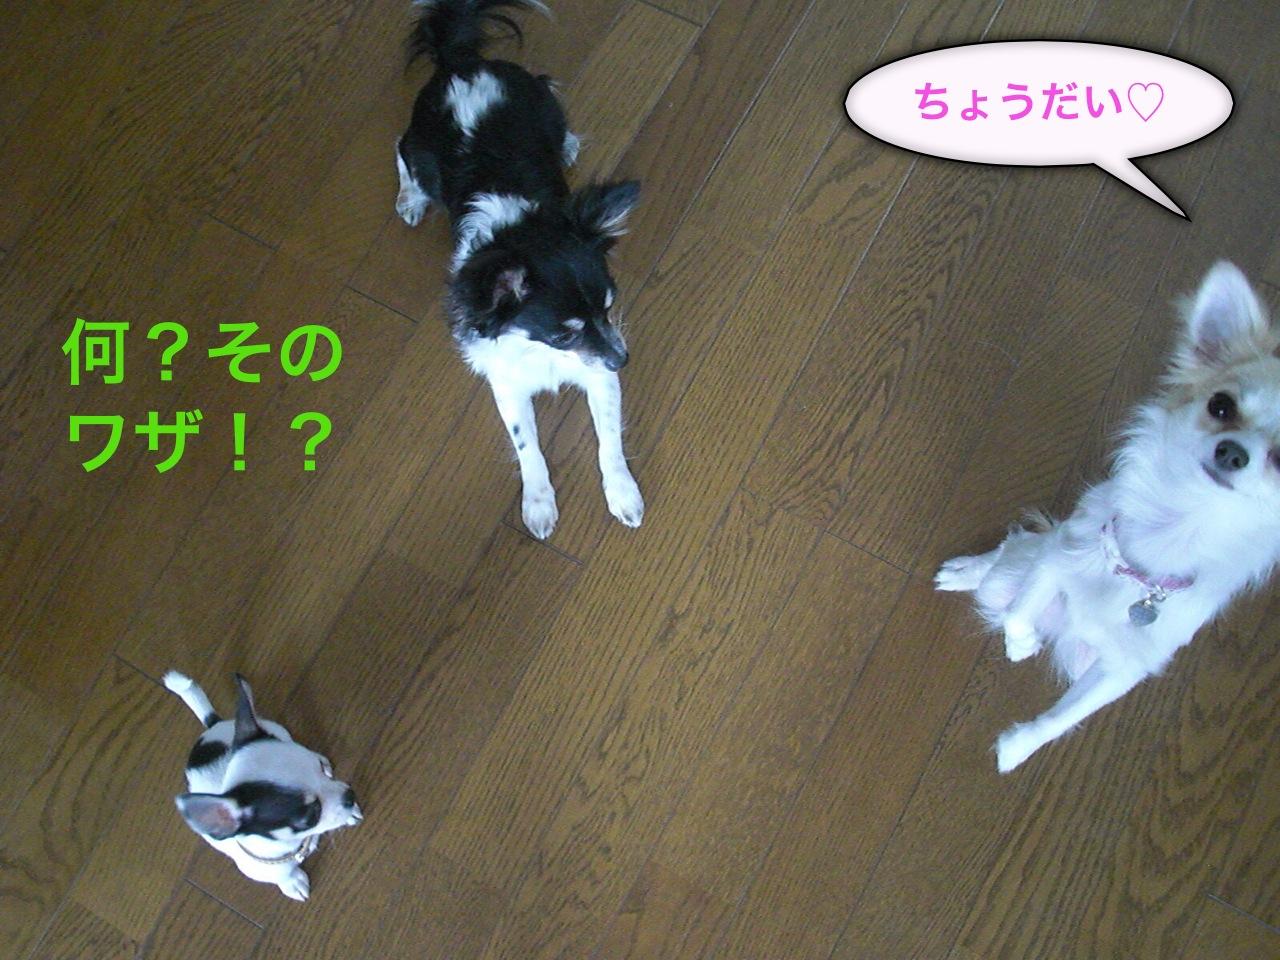 moblog_7412f459.jpg